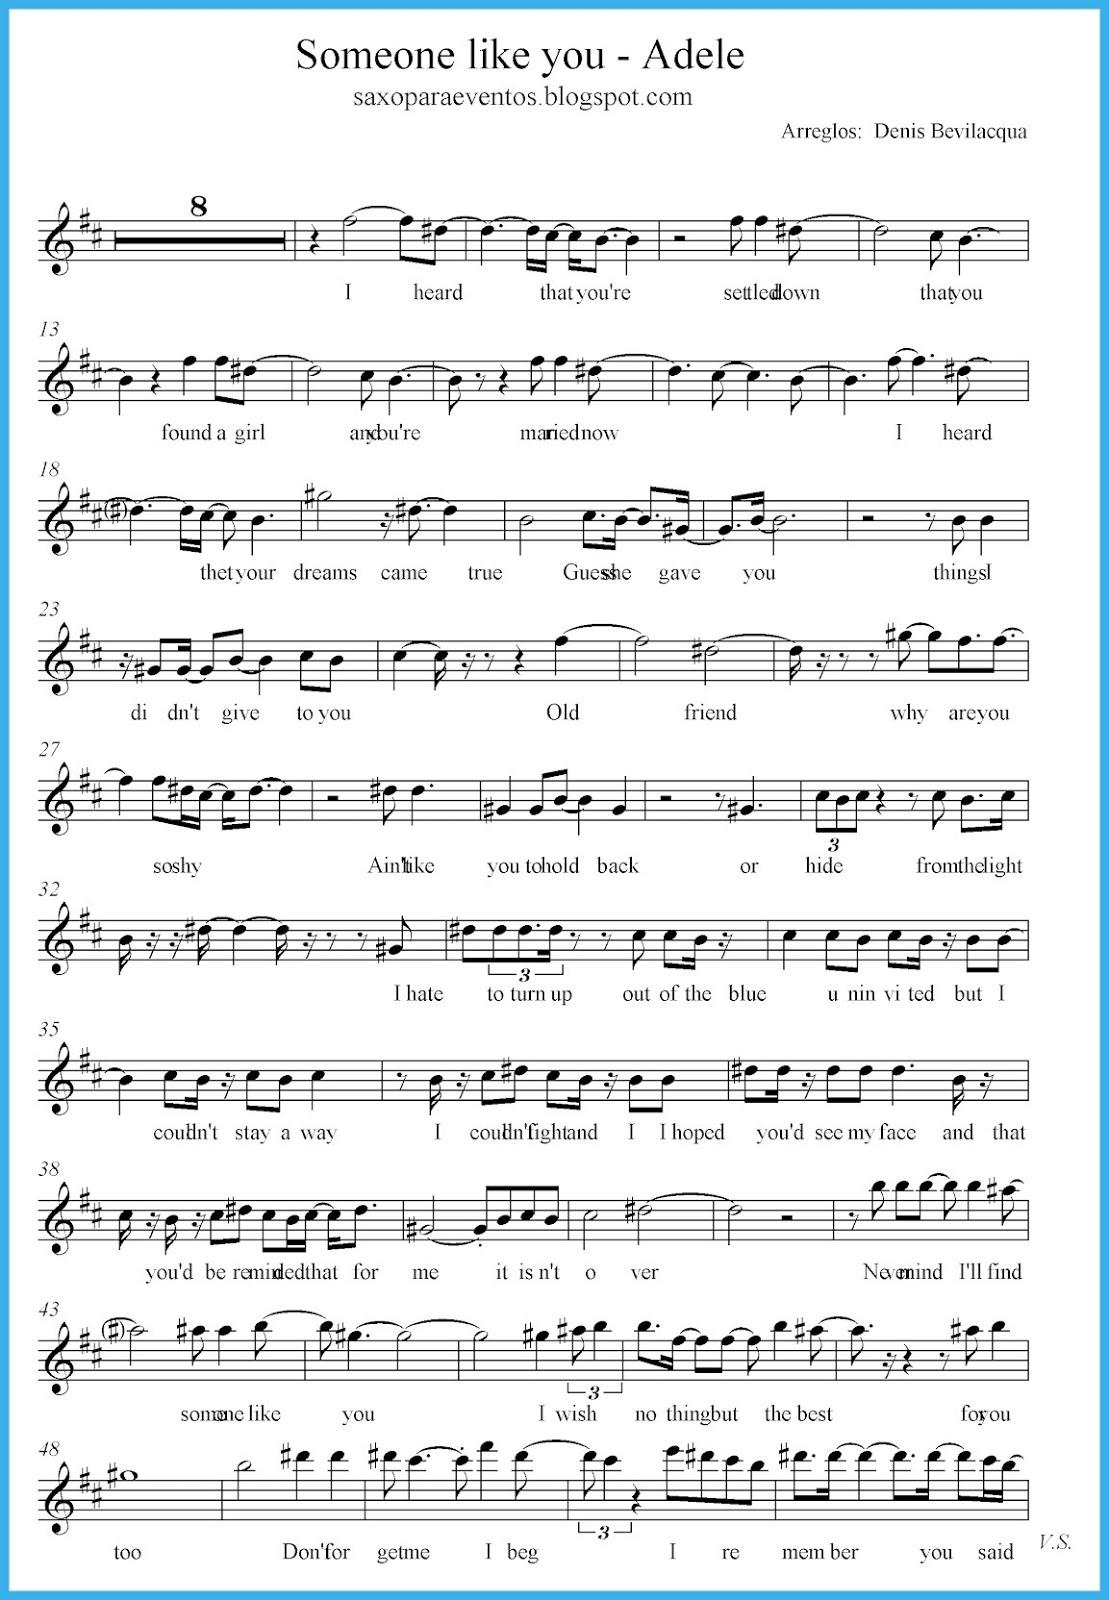 Someone like you - Adele score and track (Sheet music free) | Free ...